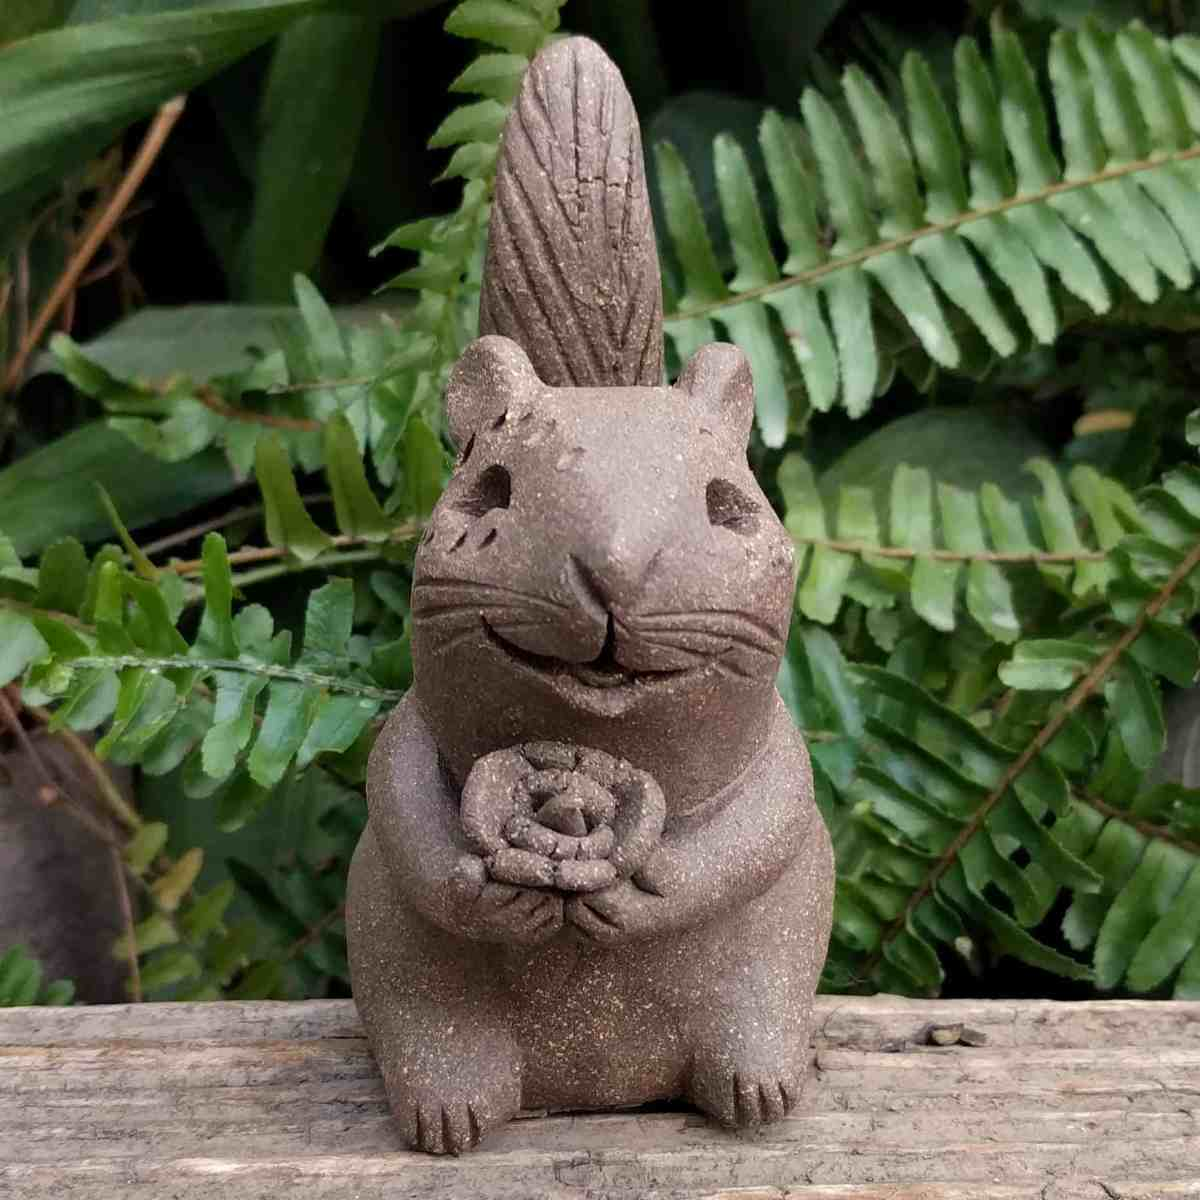 ceramic-chipmunk-holding-flower-tail-up-outdoor-sculpture-by-margaret-hudson-earth-arts-studio-1